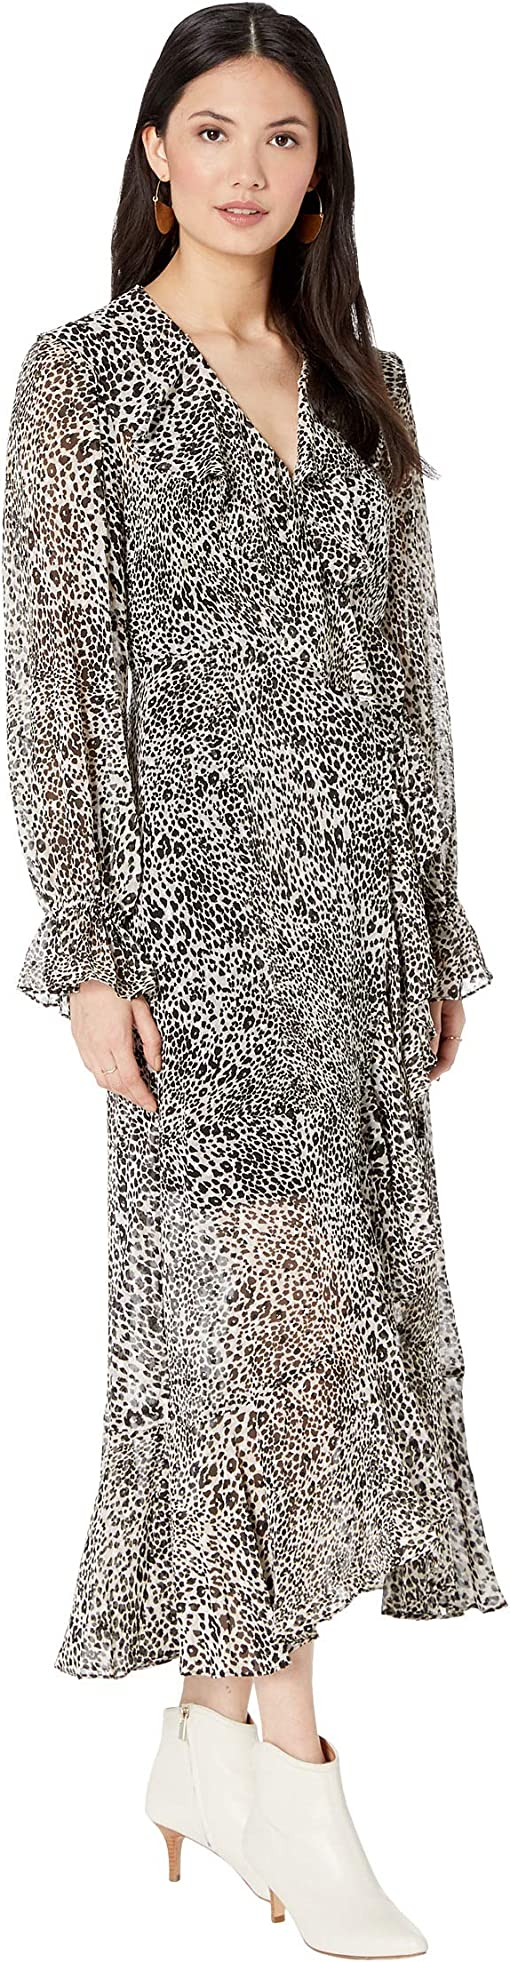 Optic White Swirling Leopard